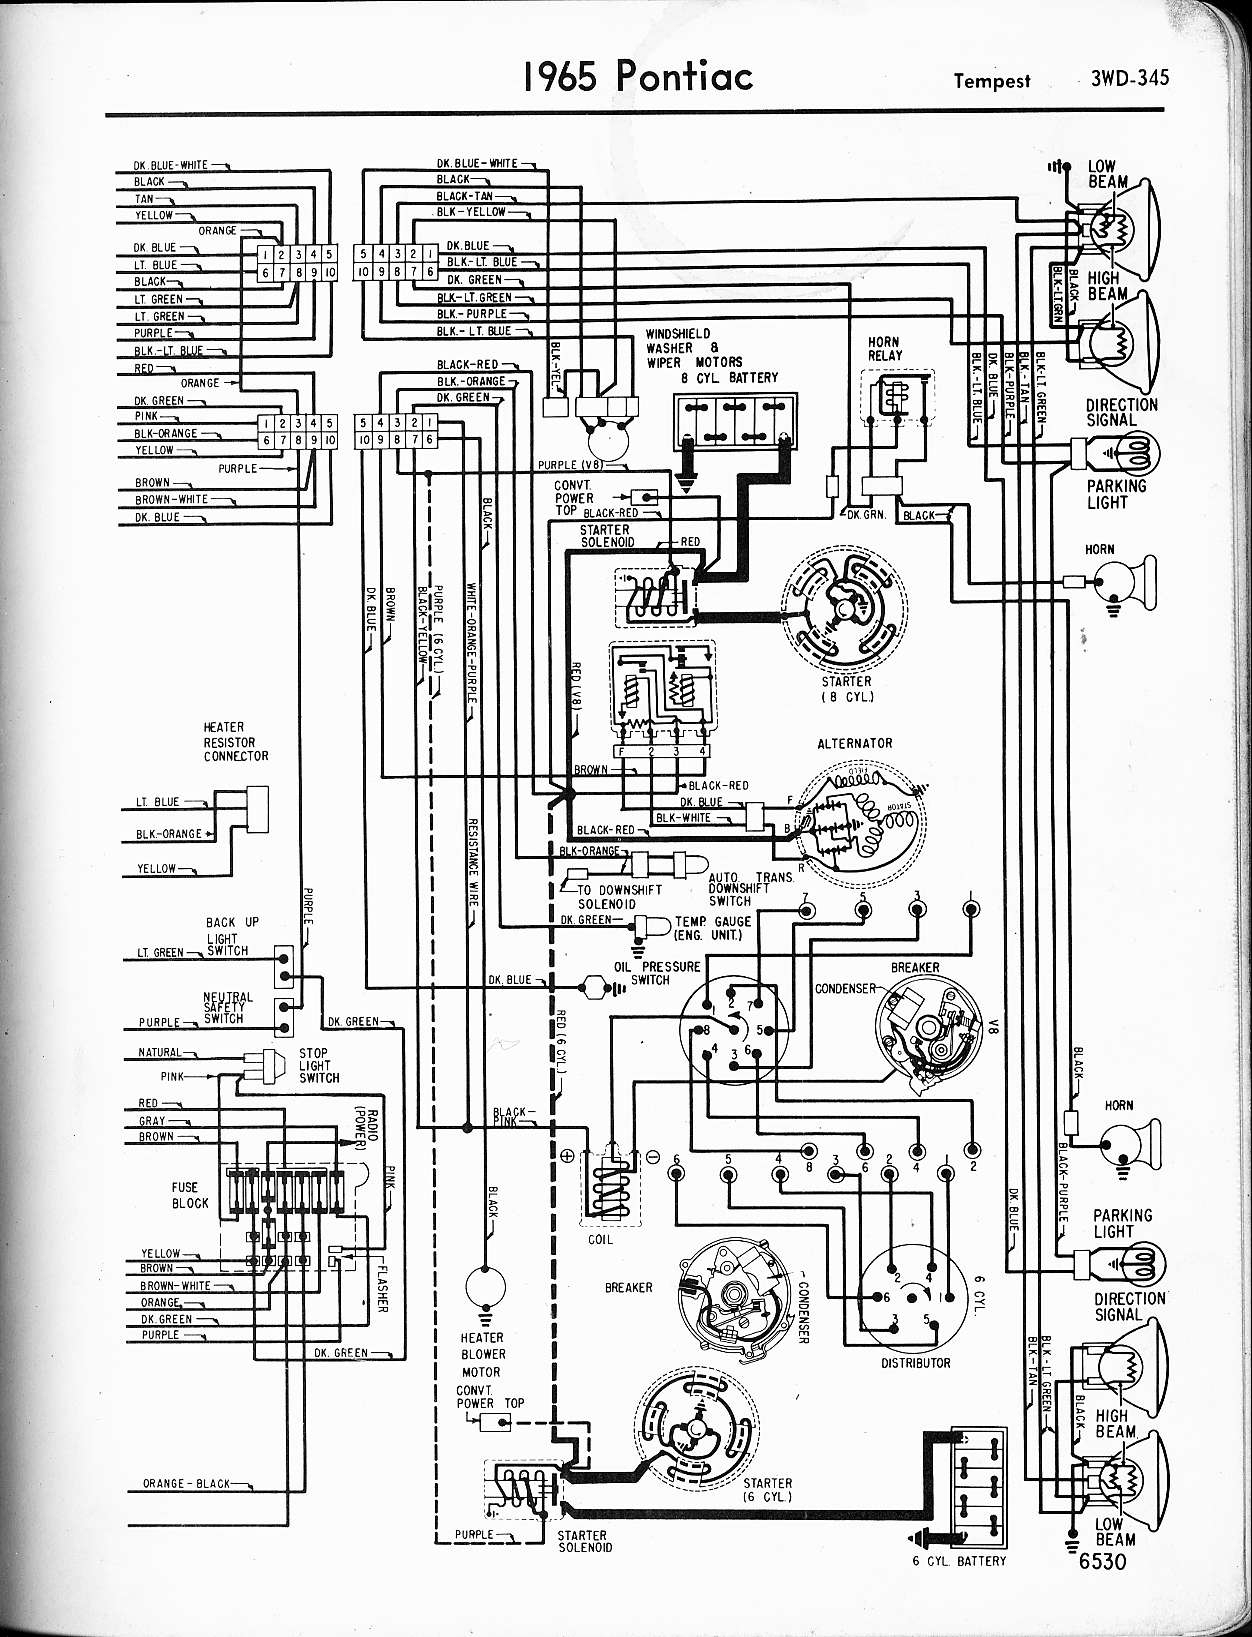 Diagram Emg Hz H4 Wiring Diagram Full Version Hd Quality